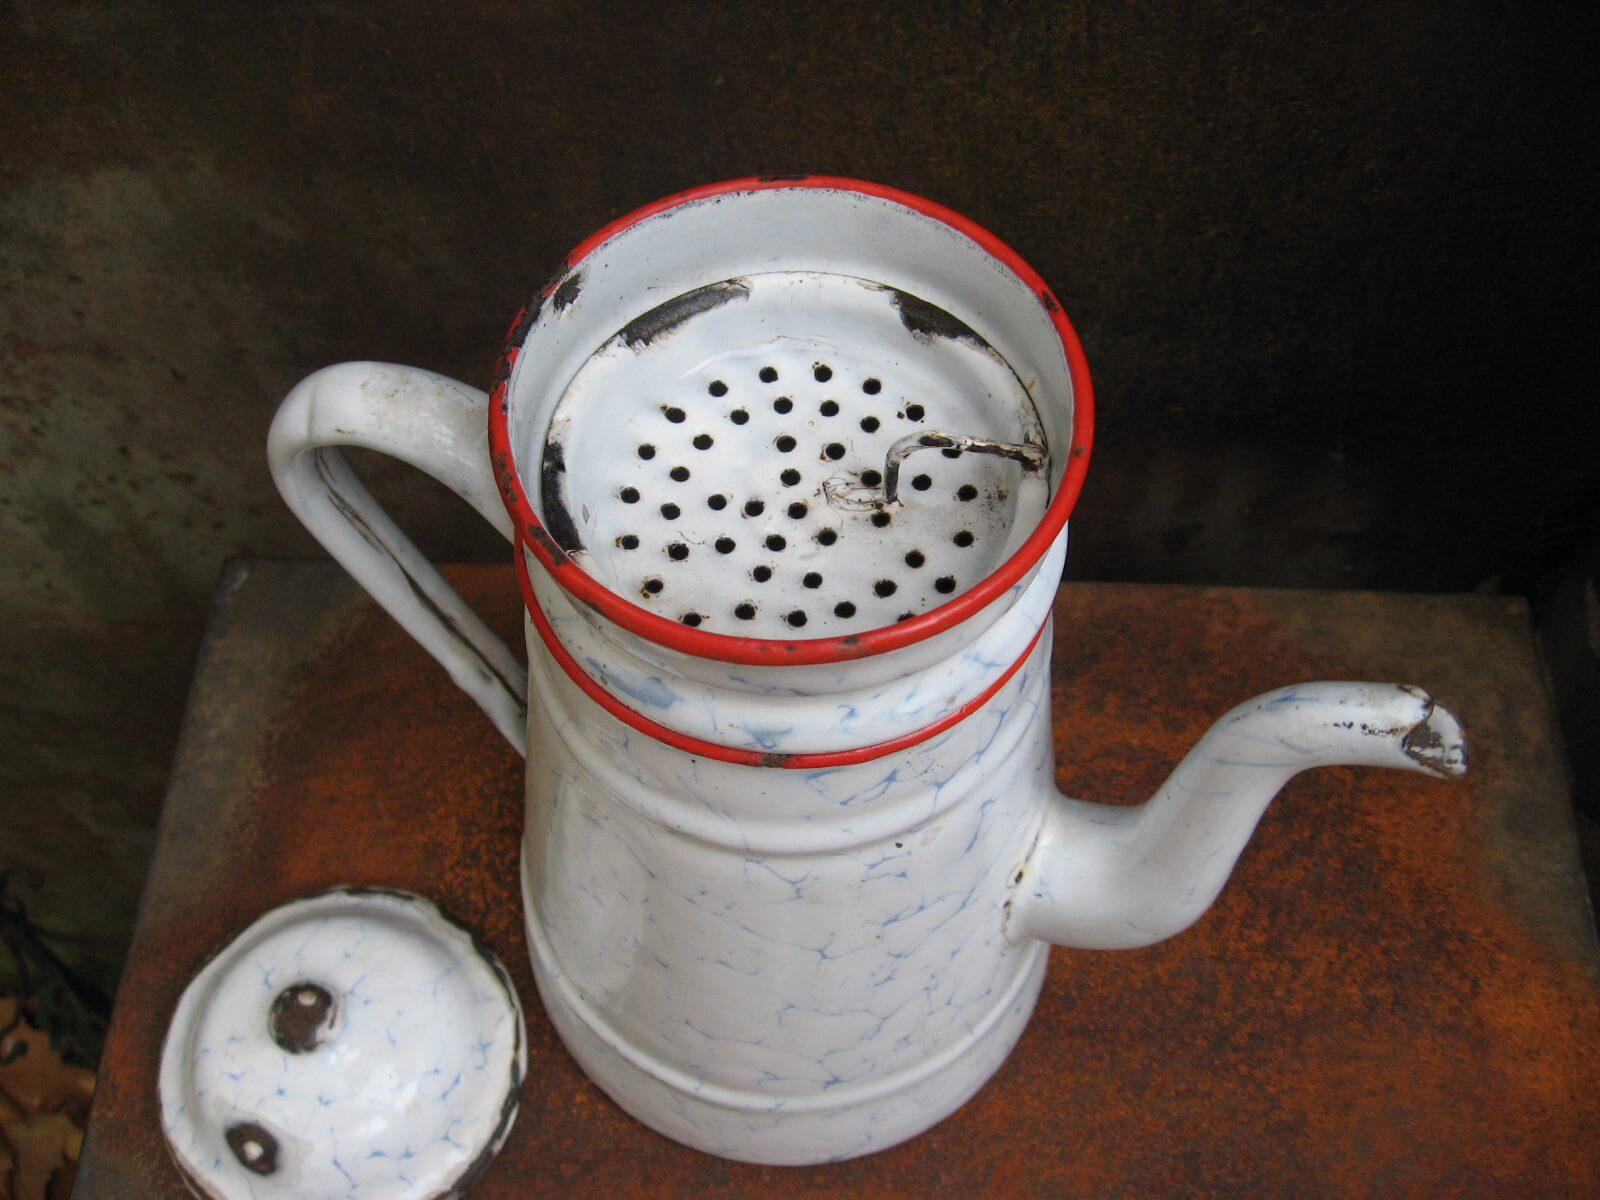 Graniteware enamel 3 part coffee pot at PumpjackPiddlewick